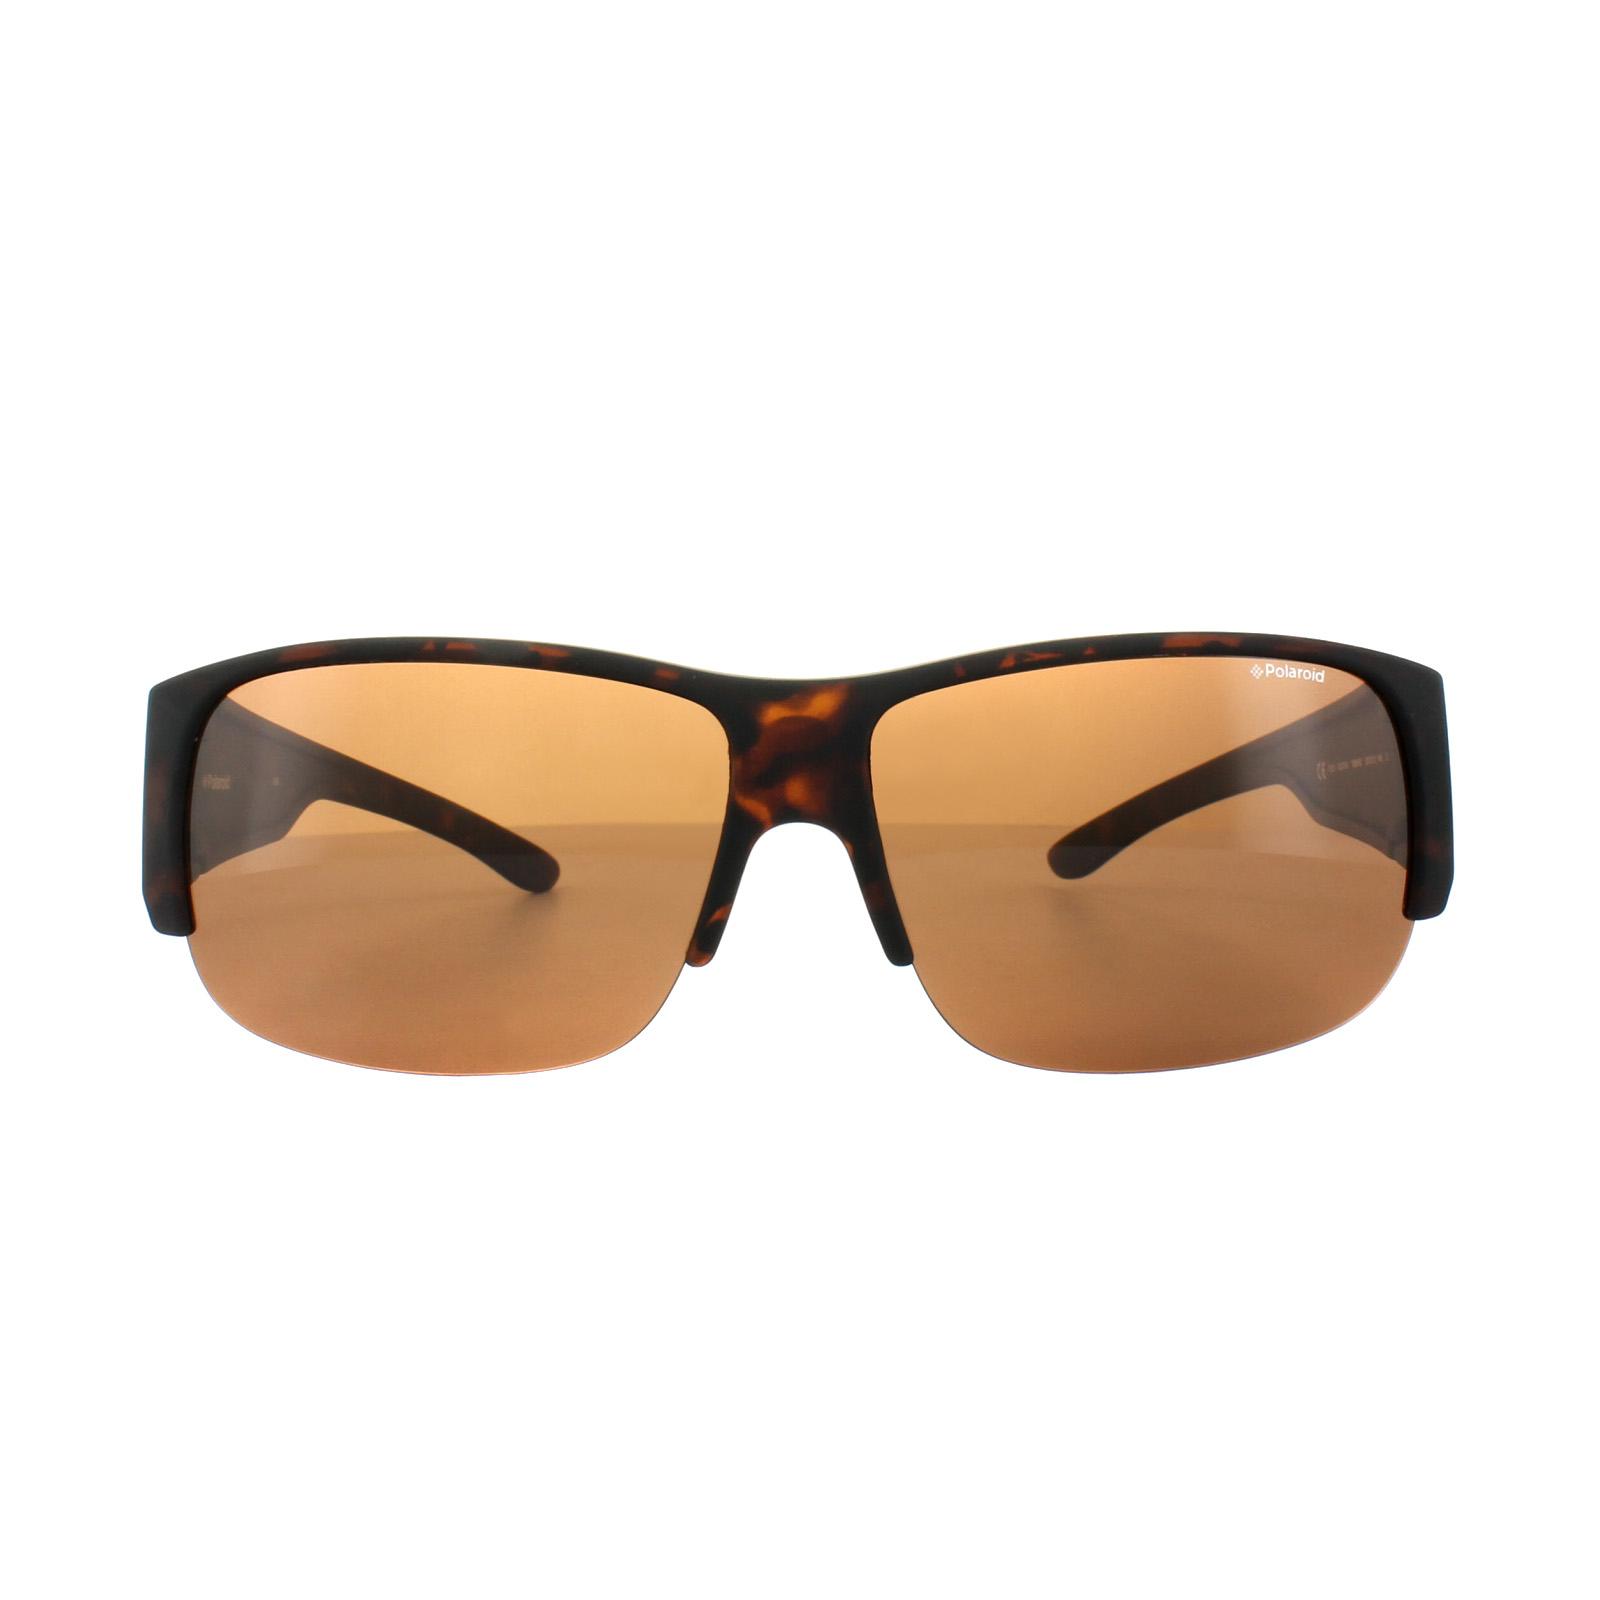 Polaroid PLD 9007S V08 HE Sonnenbrille Damenbrille 6mPpuVBzIu